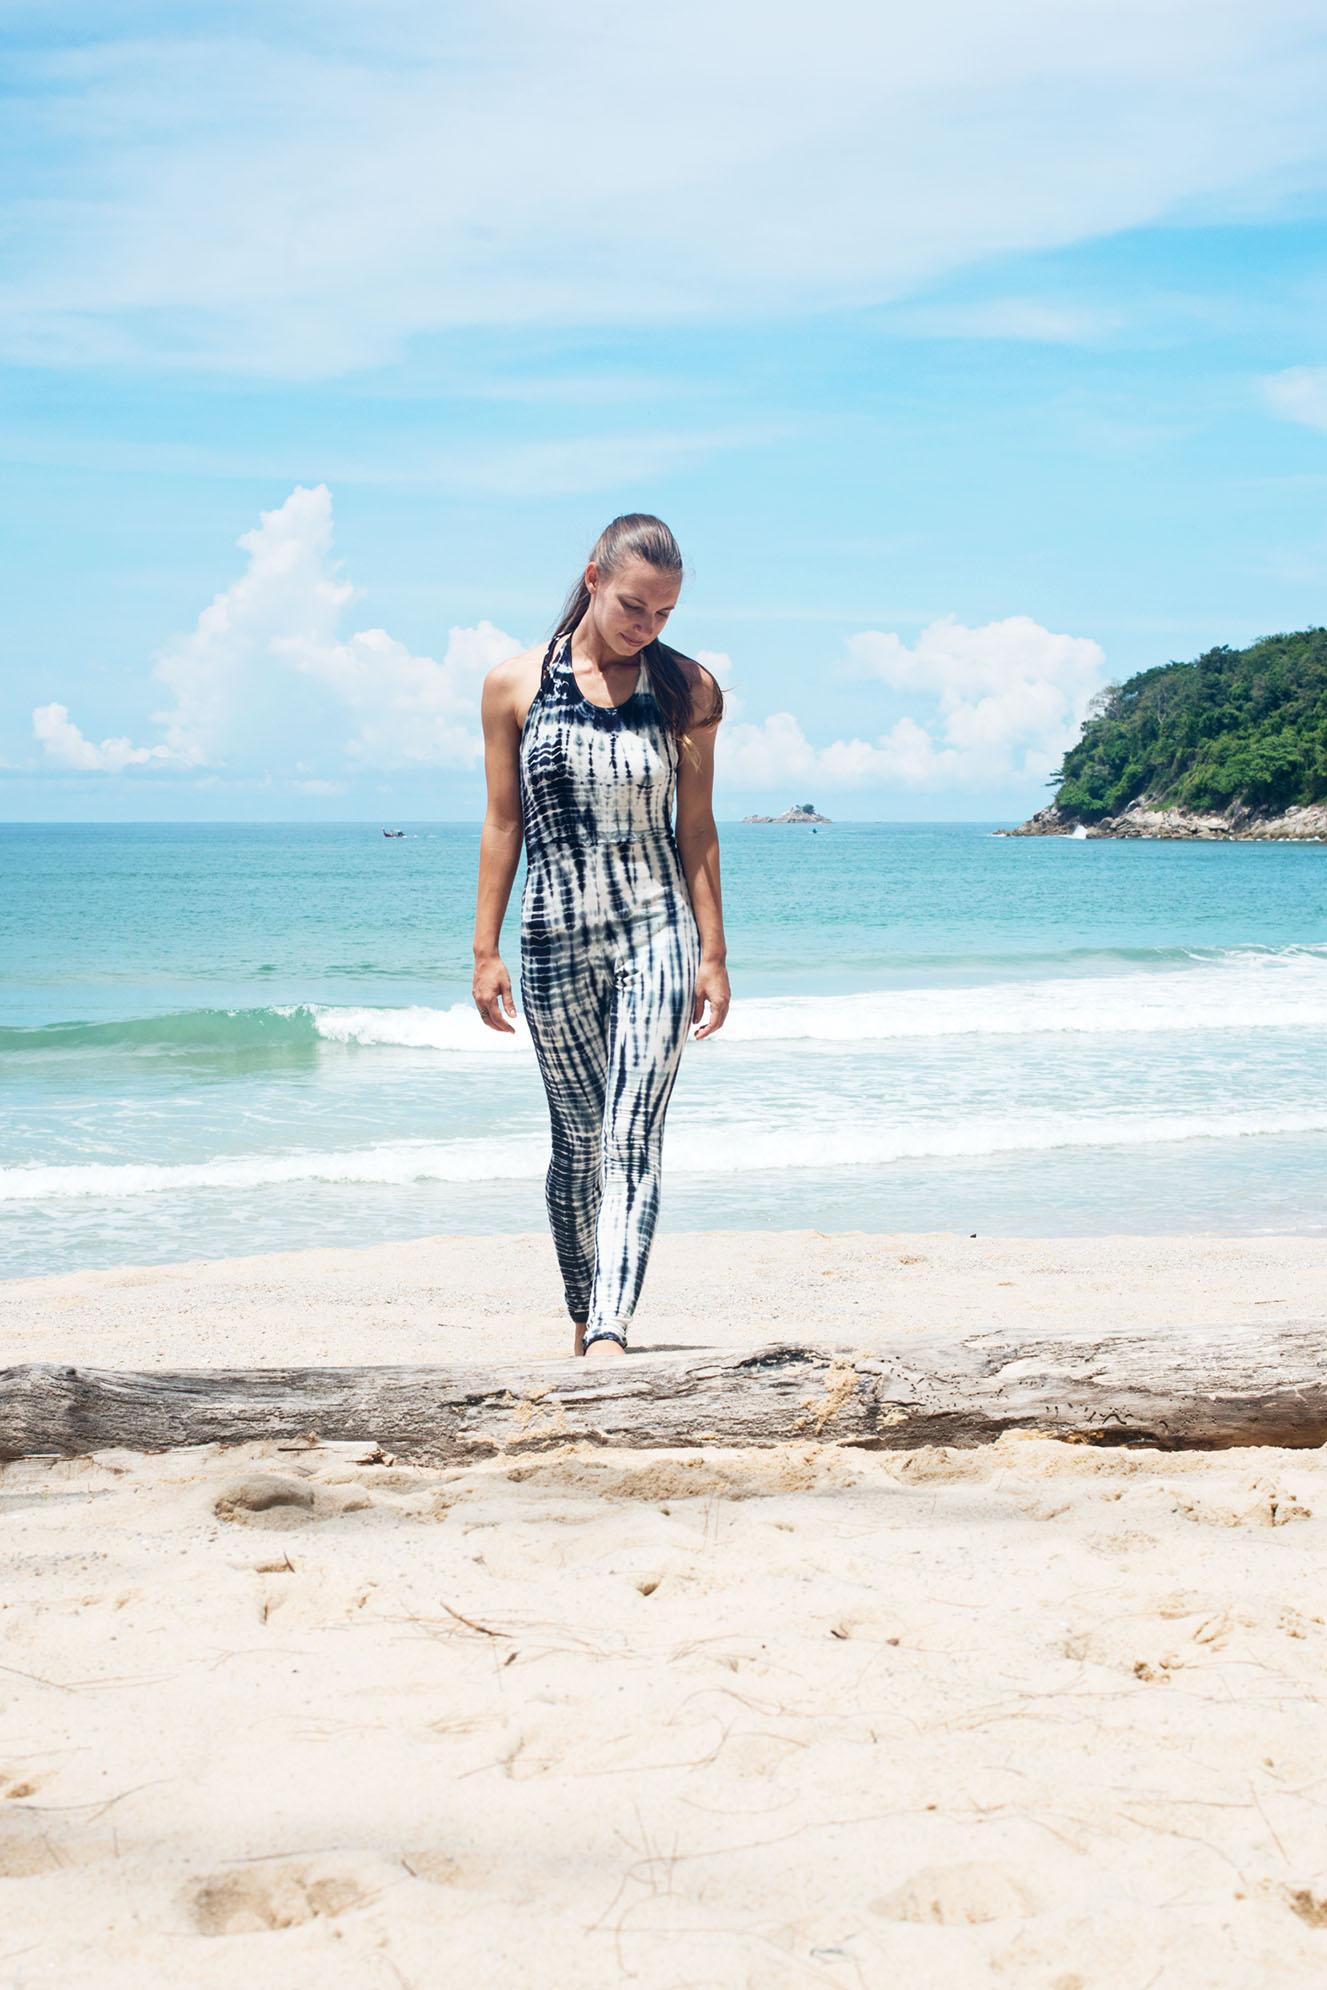 Reversed Worrior Walking Omlala Yoga Tie Dye Jumpsuit Legging Phuket